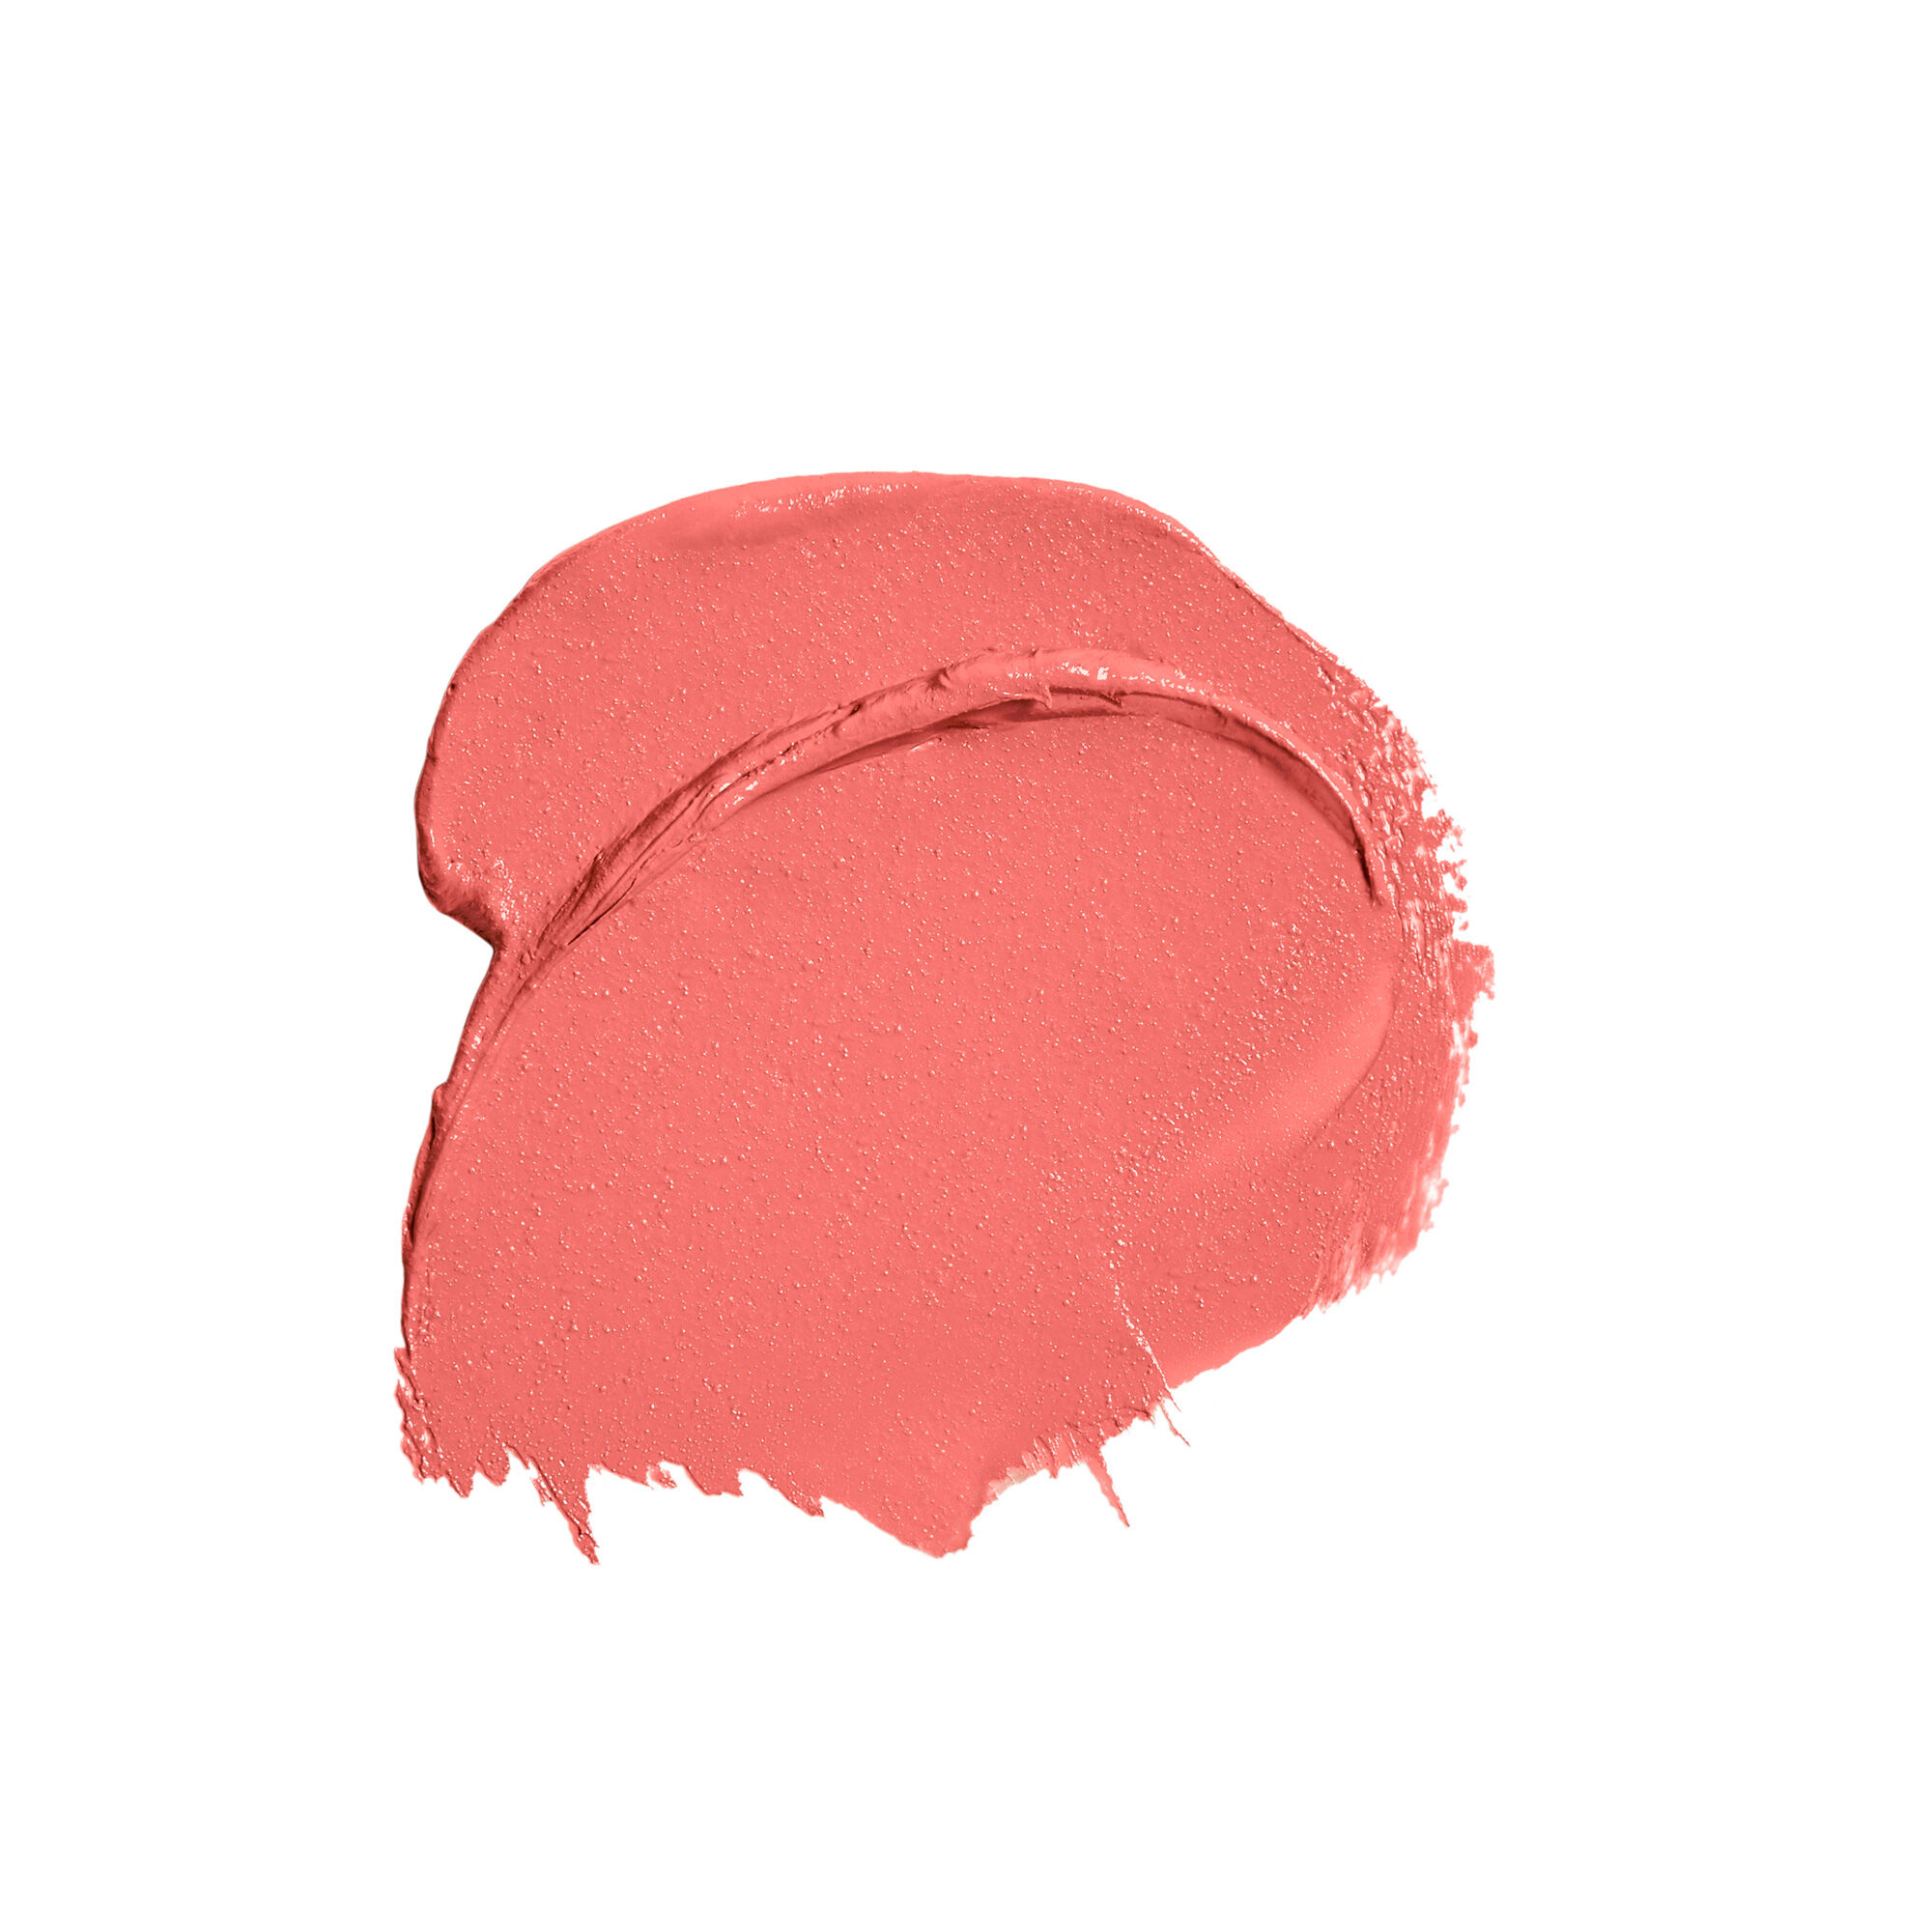 Creme Cheek + Lip Color, Peony Pink